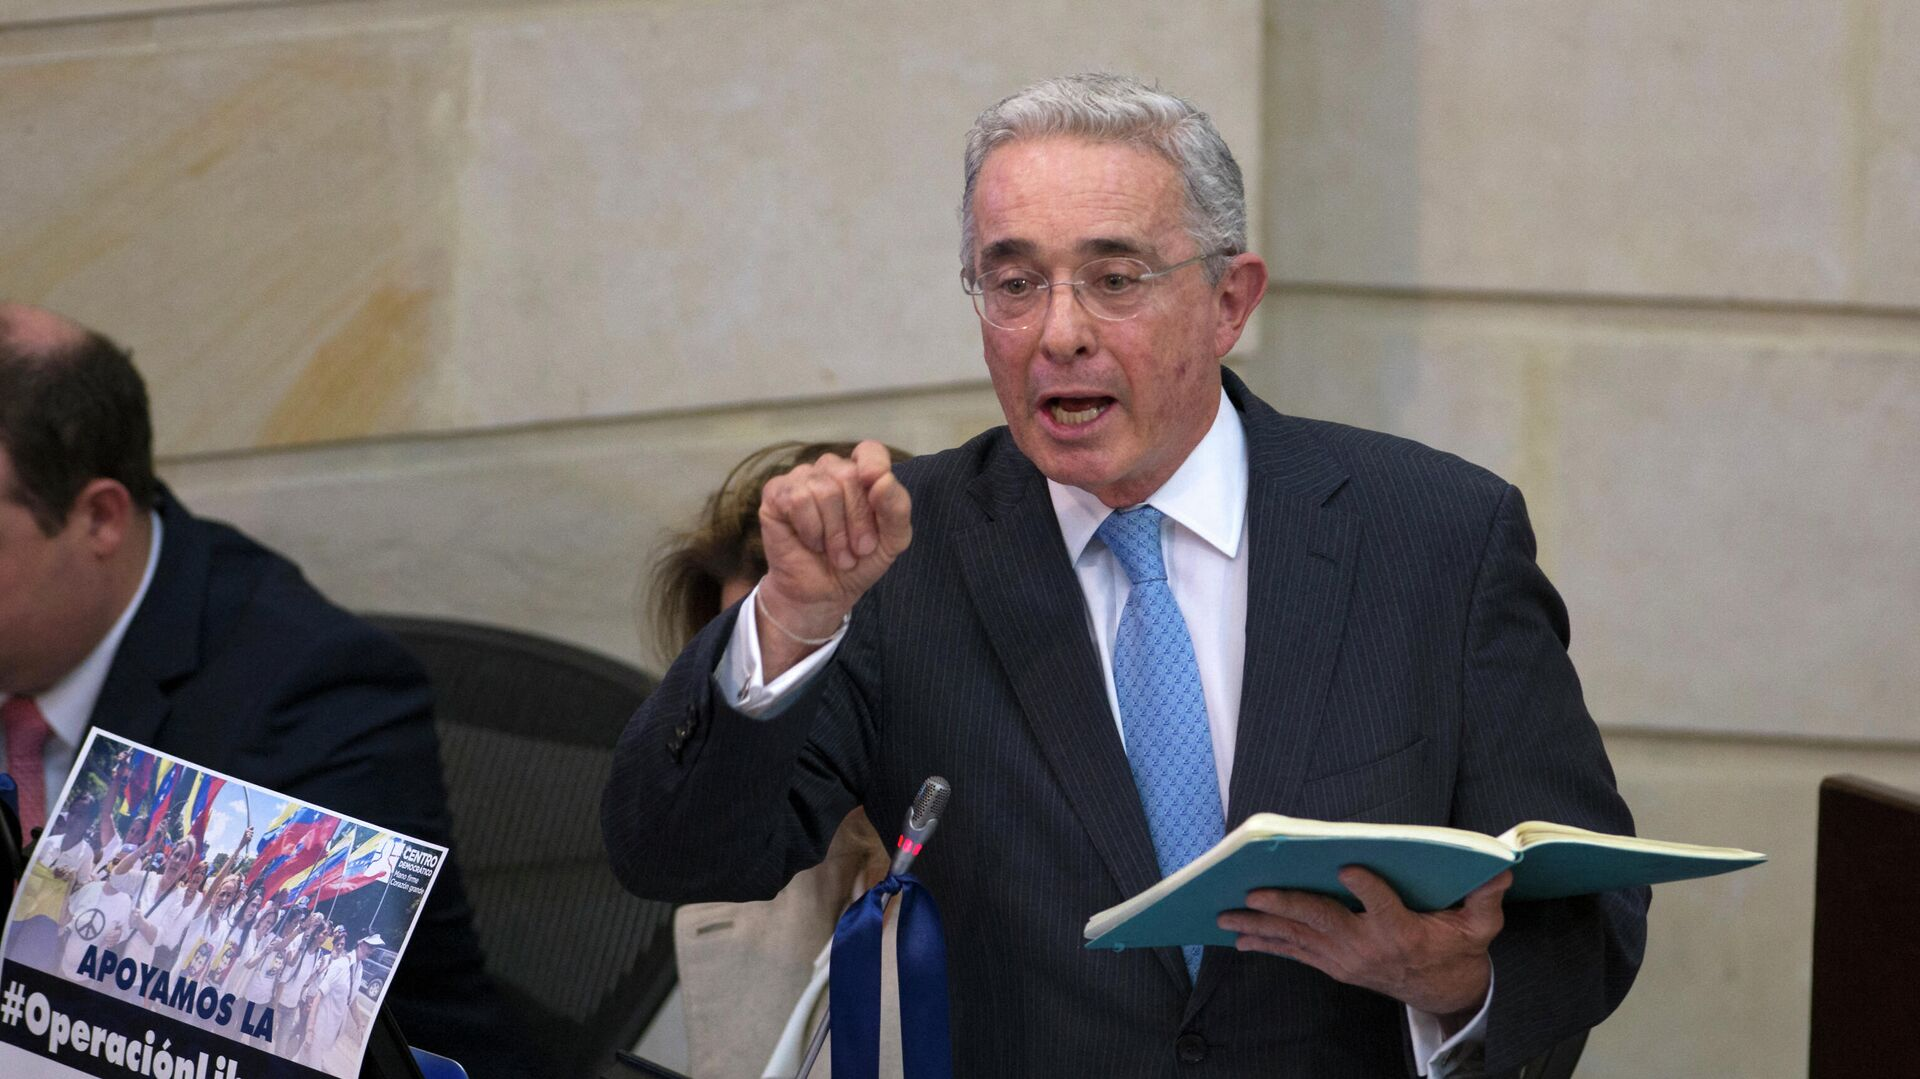 Álvaro Uribe, expresidente y exsenador colombiano - Sputnik Mundo, 1920, 09.04.2021